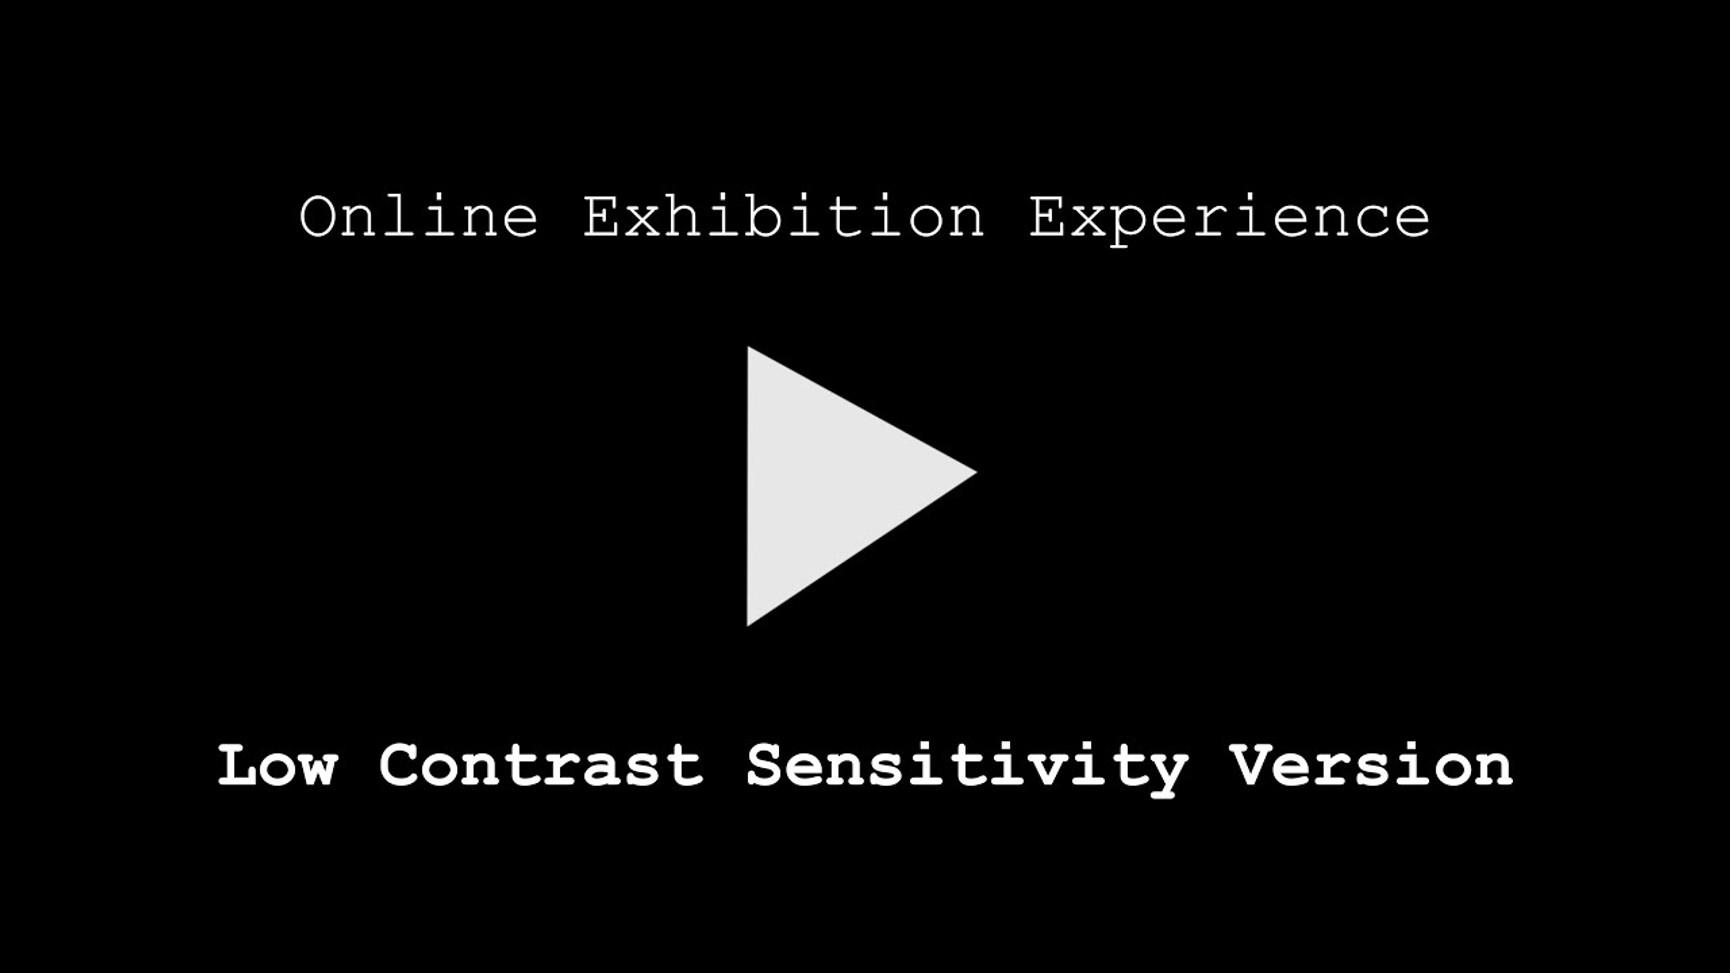 Low Contrast Sensitivity Version